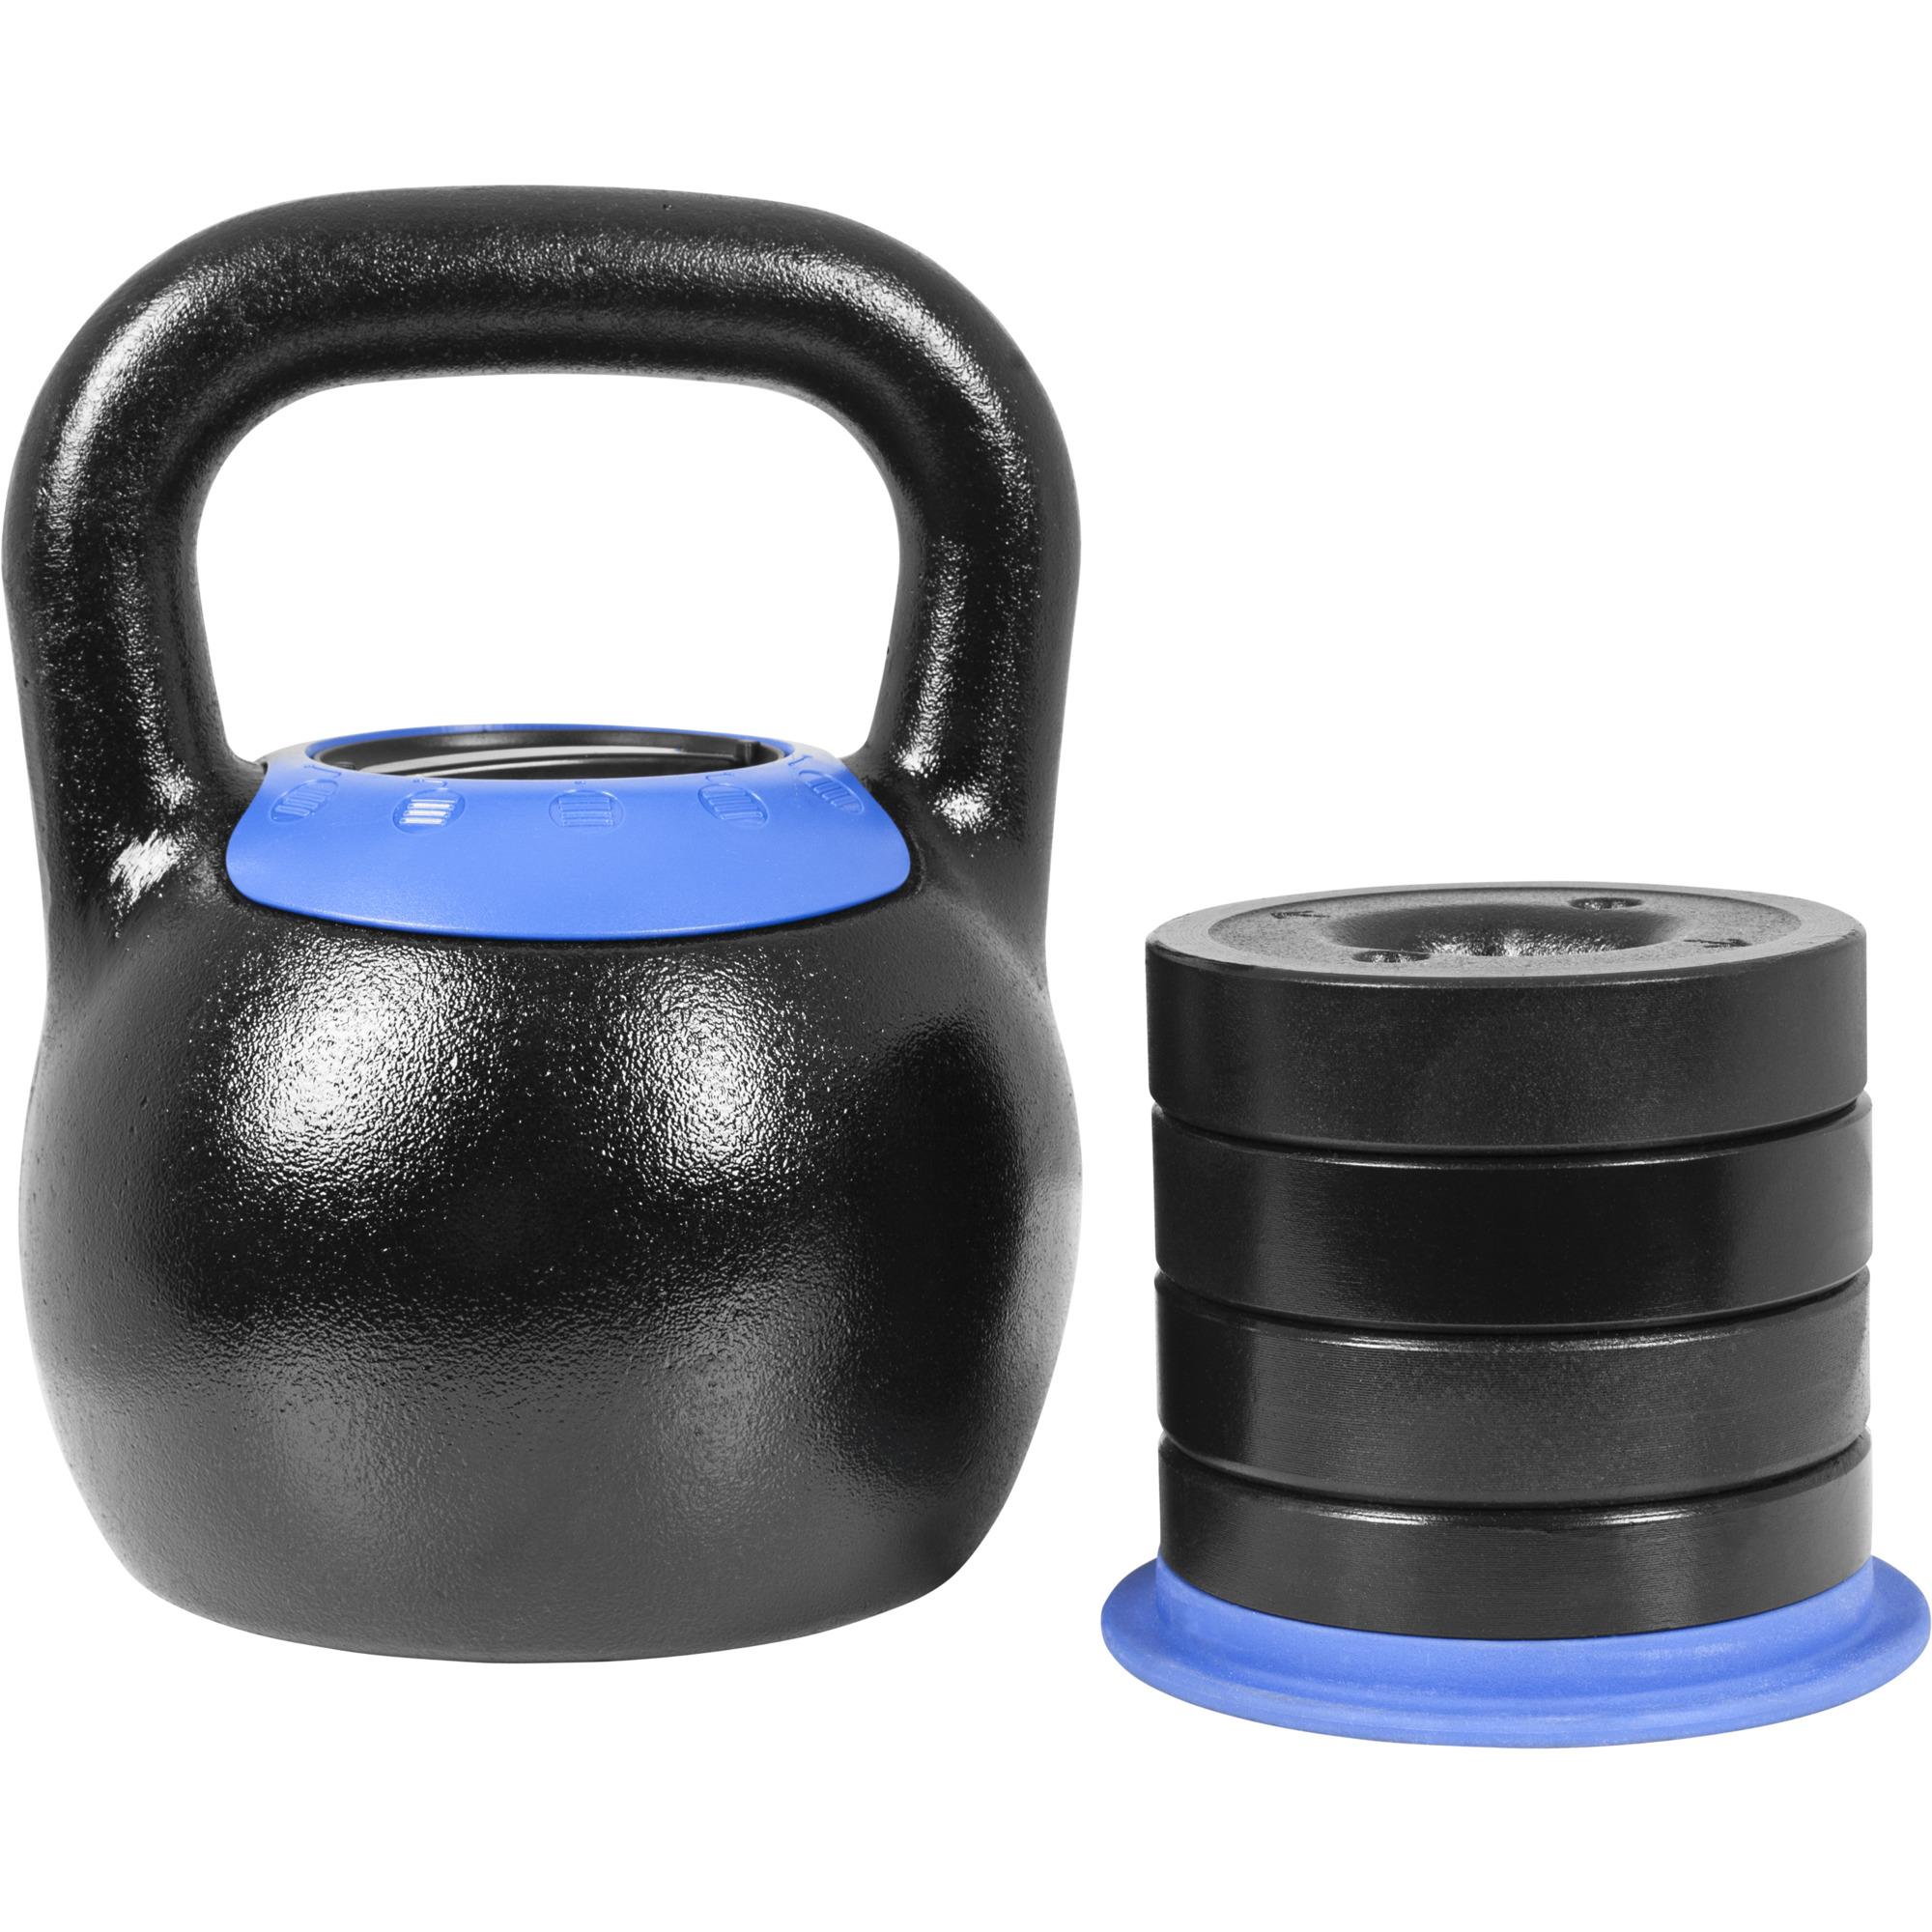 Gorilla Sports Verstellbare Kettlebell 16-24 kg 100835-00001-0028